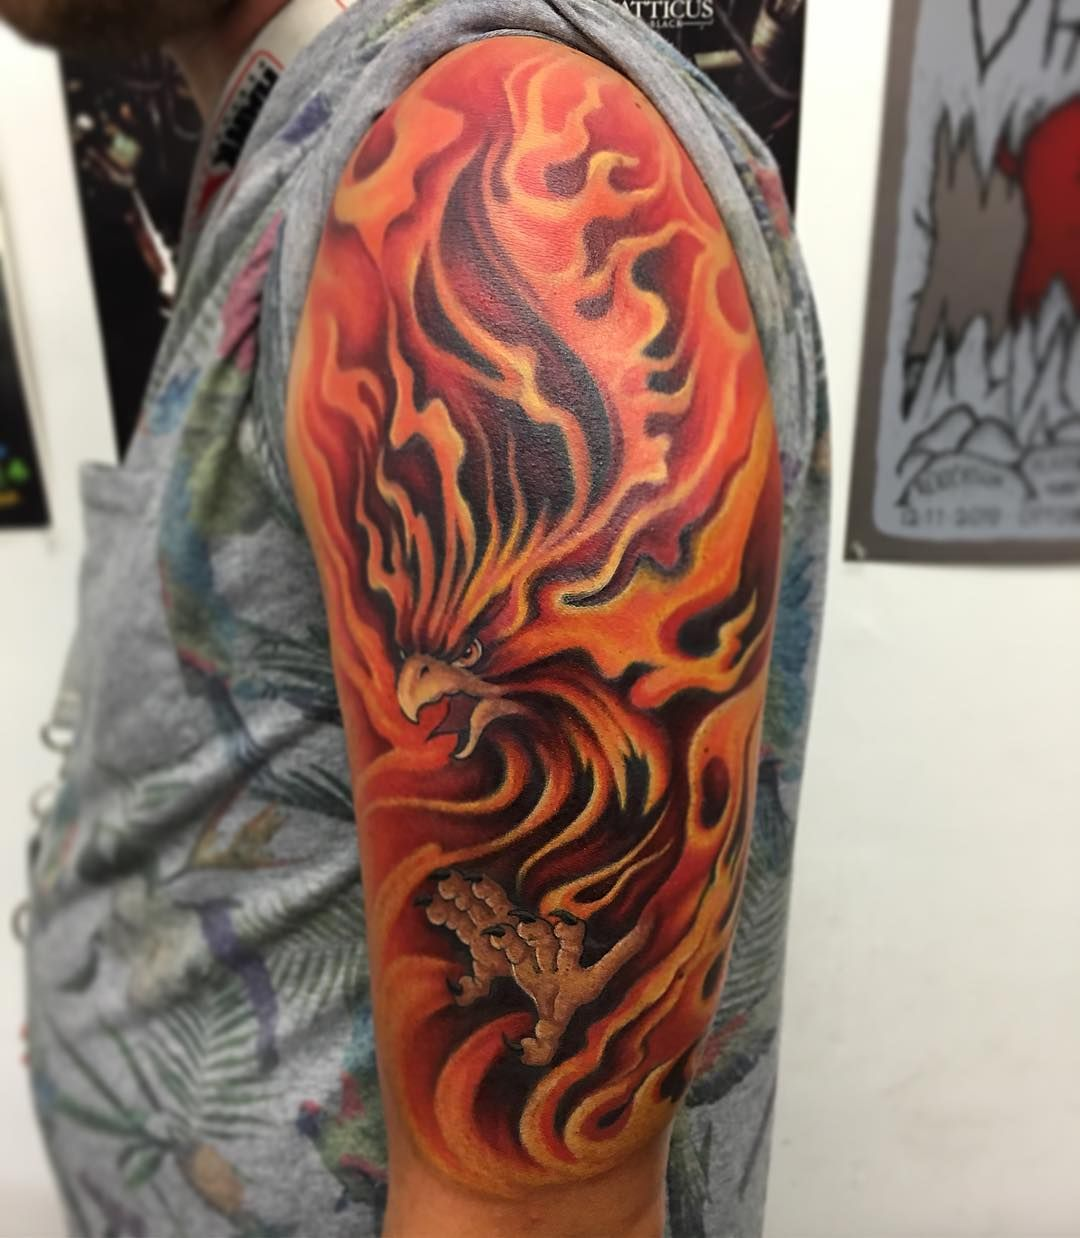 60+ Best Phoenix Tattoo Designs The Coolest Symbol for